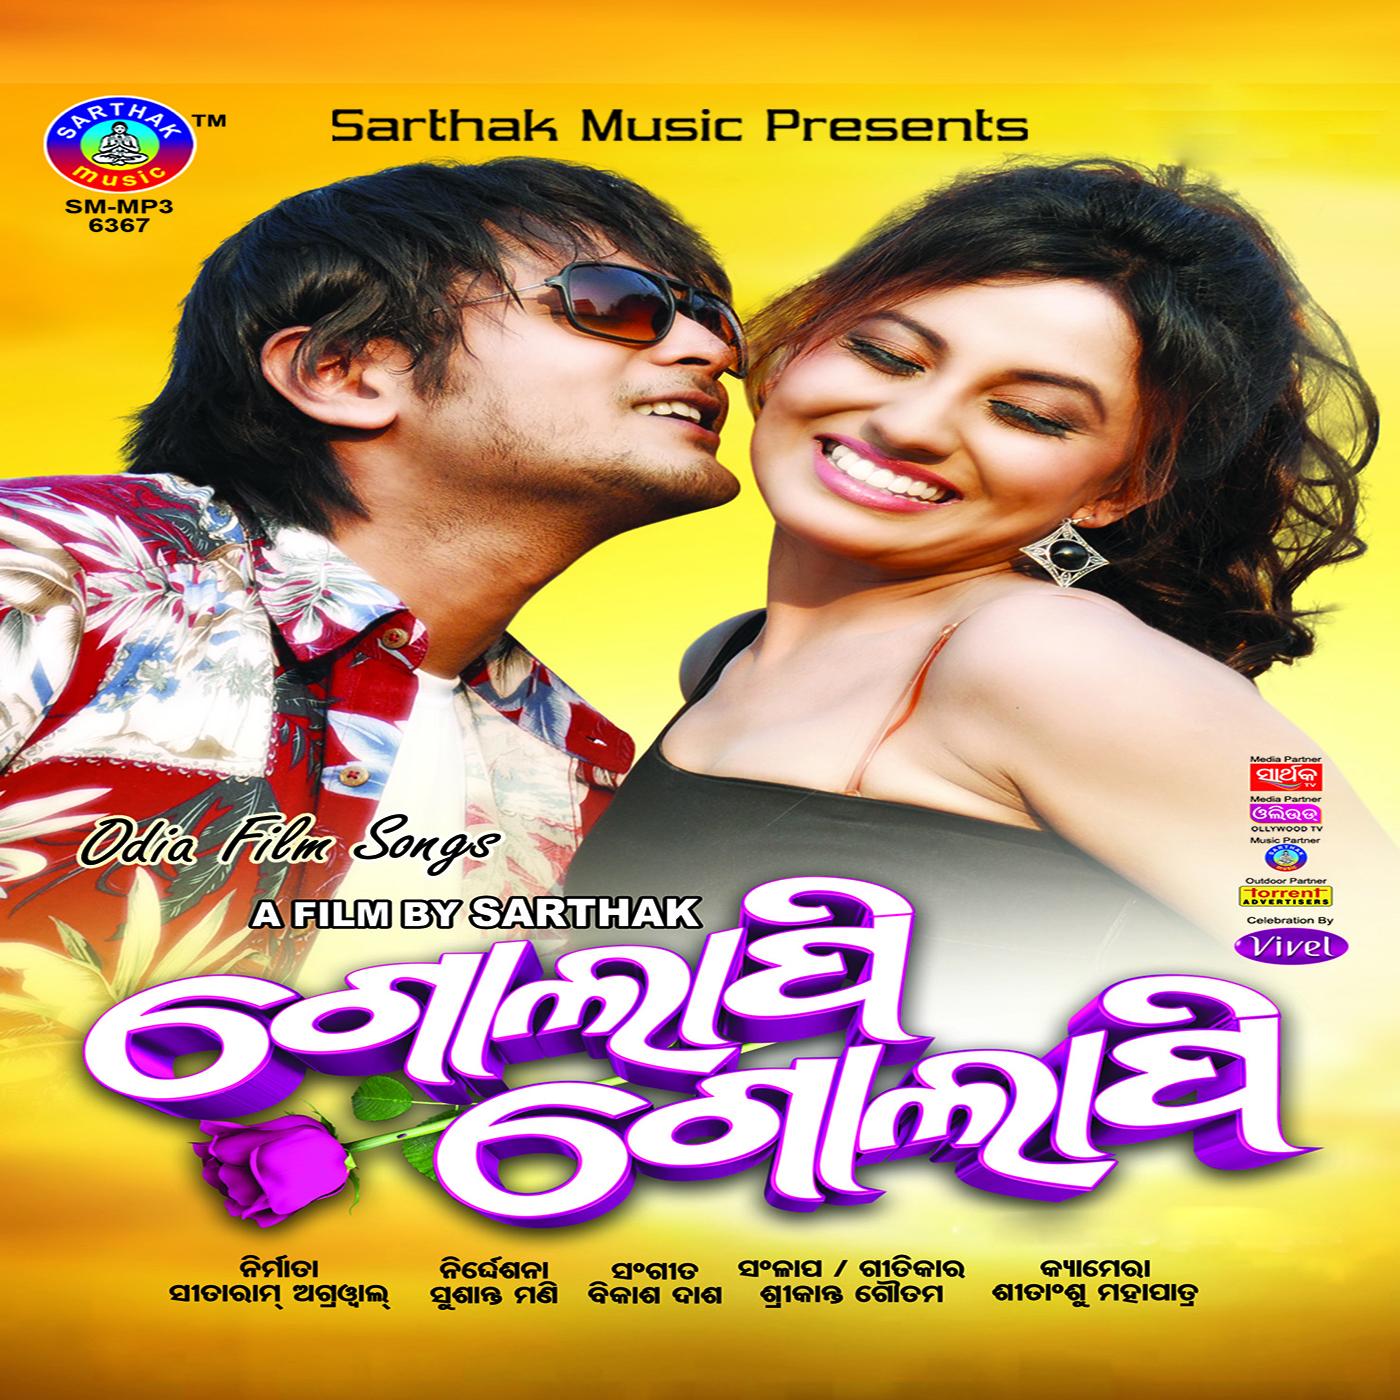 Golapi Golapi - Theme Song (Udit Narayan, Nibedita)